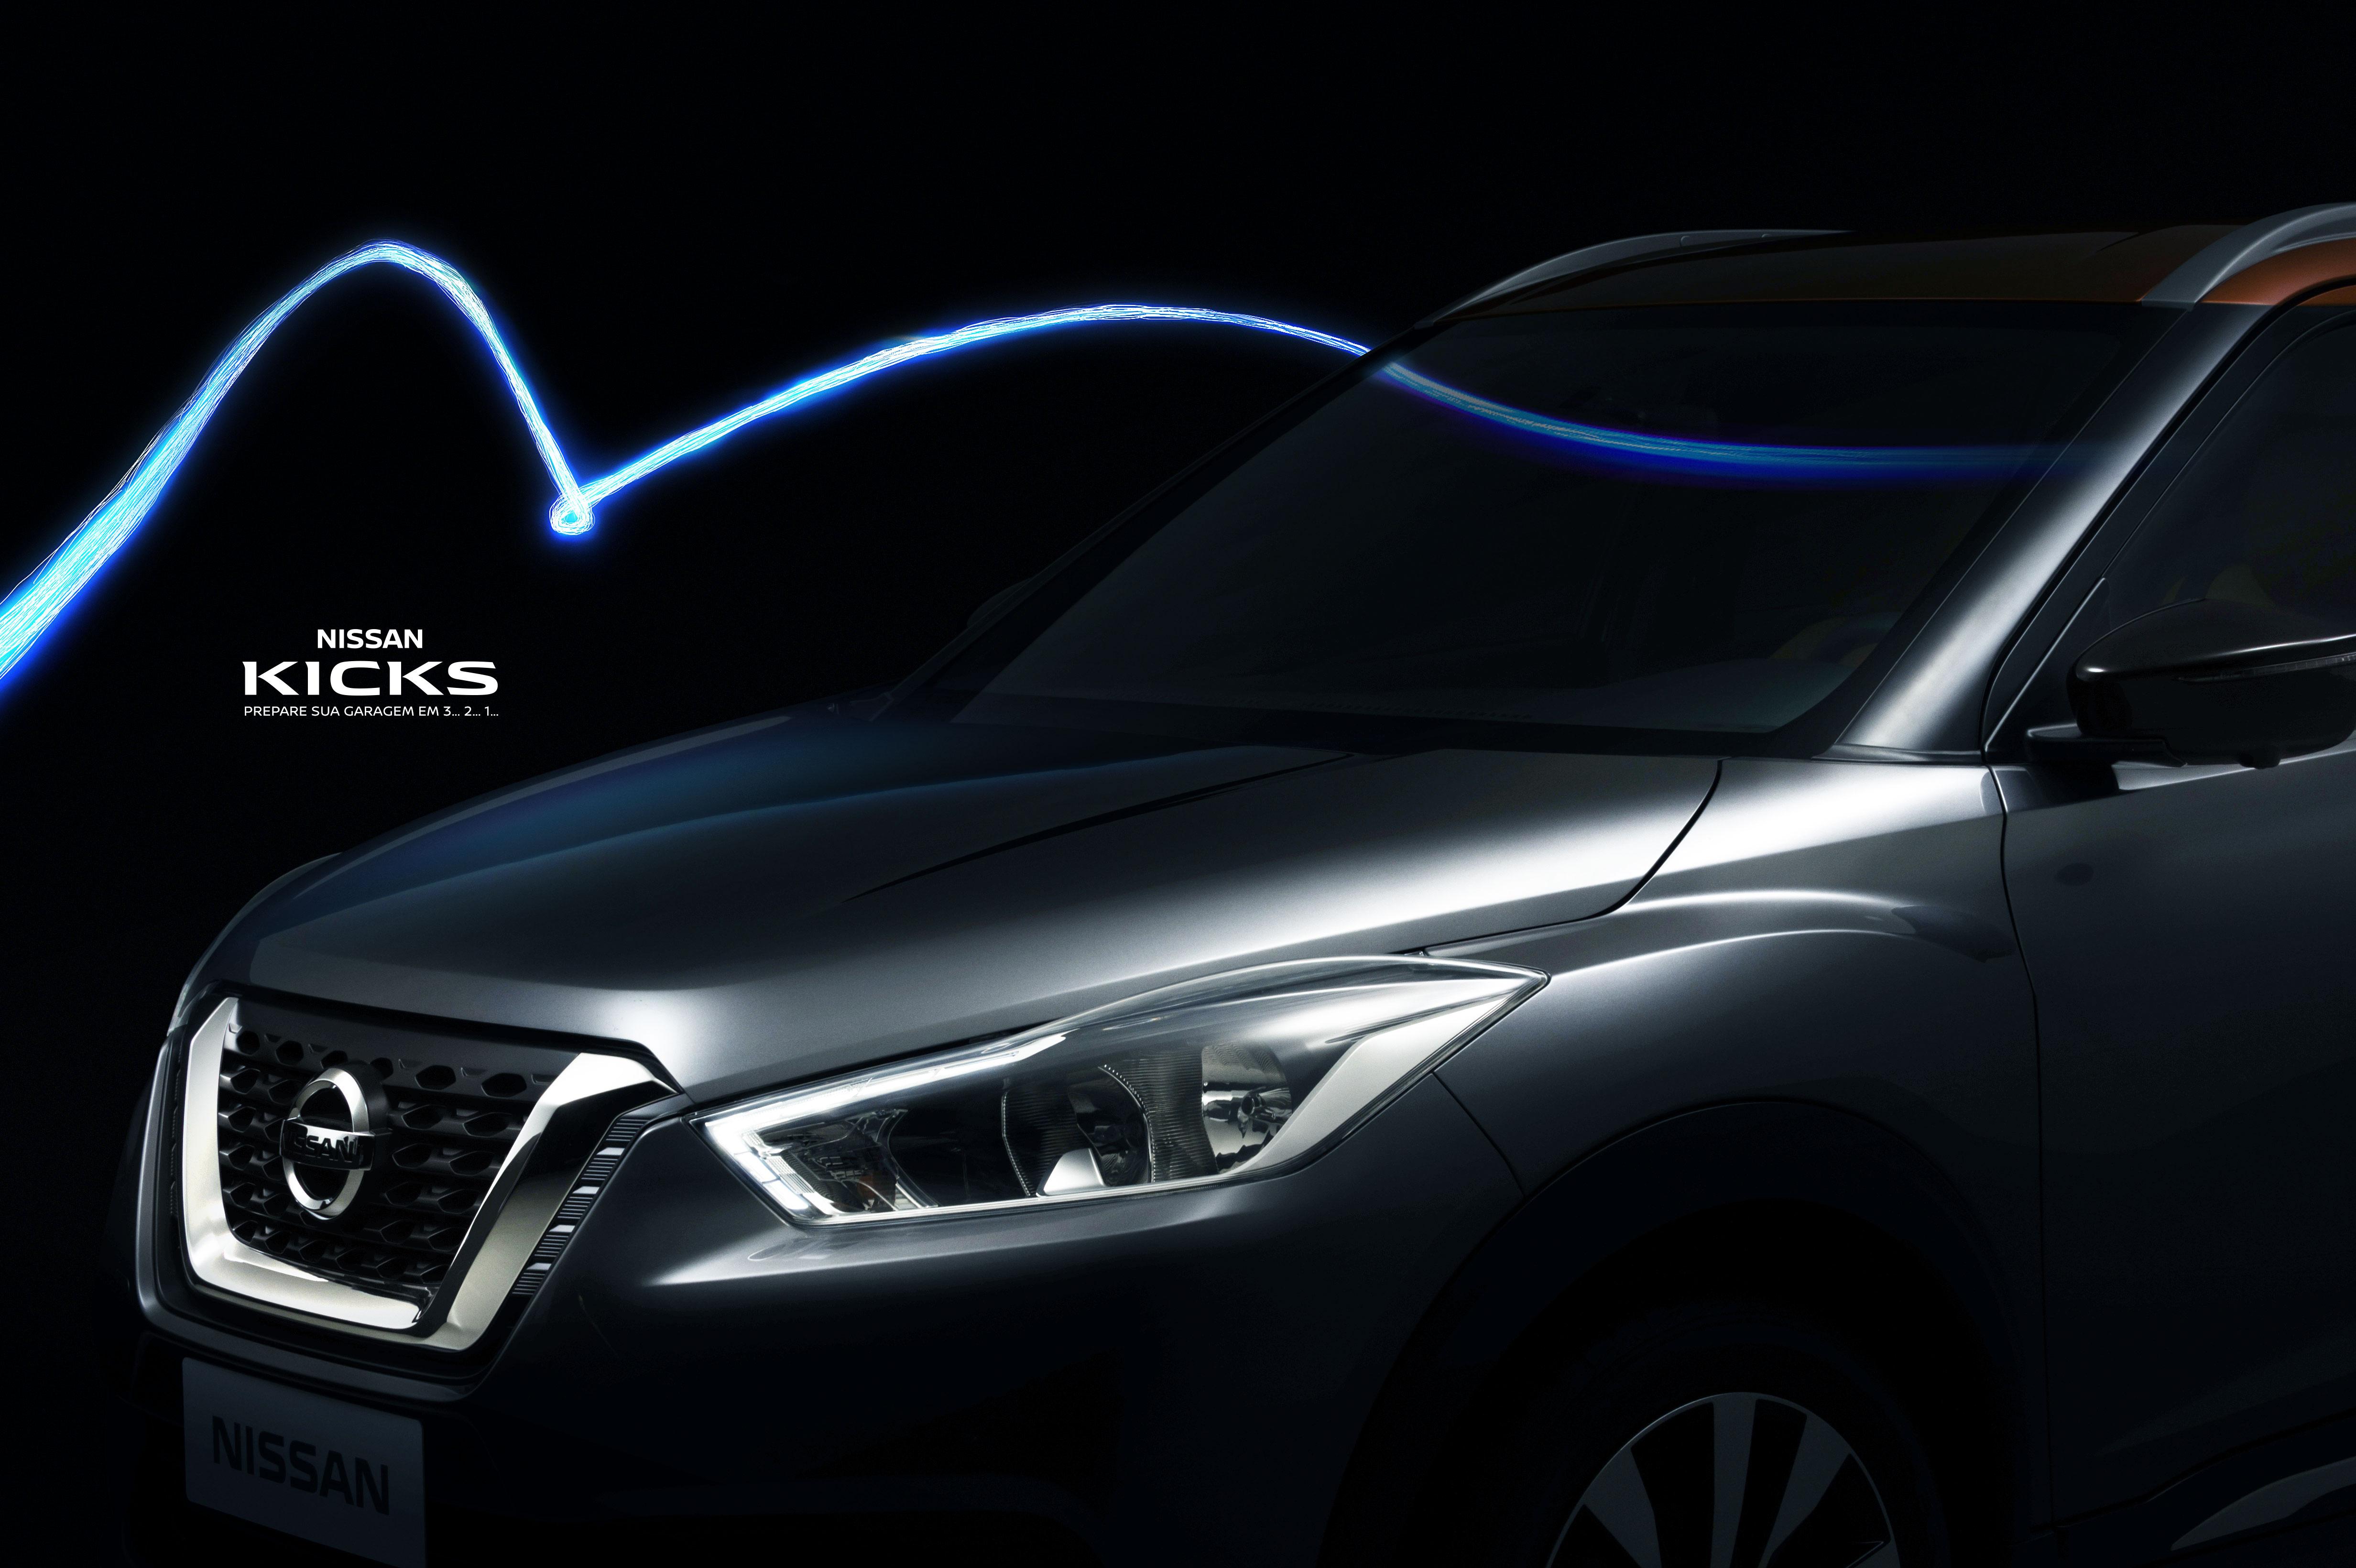 Nissan Kicks - production version front fascia shown